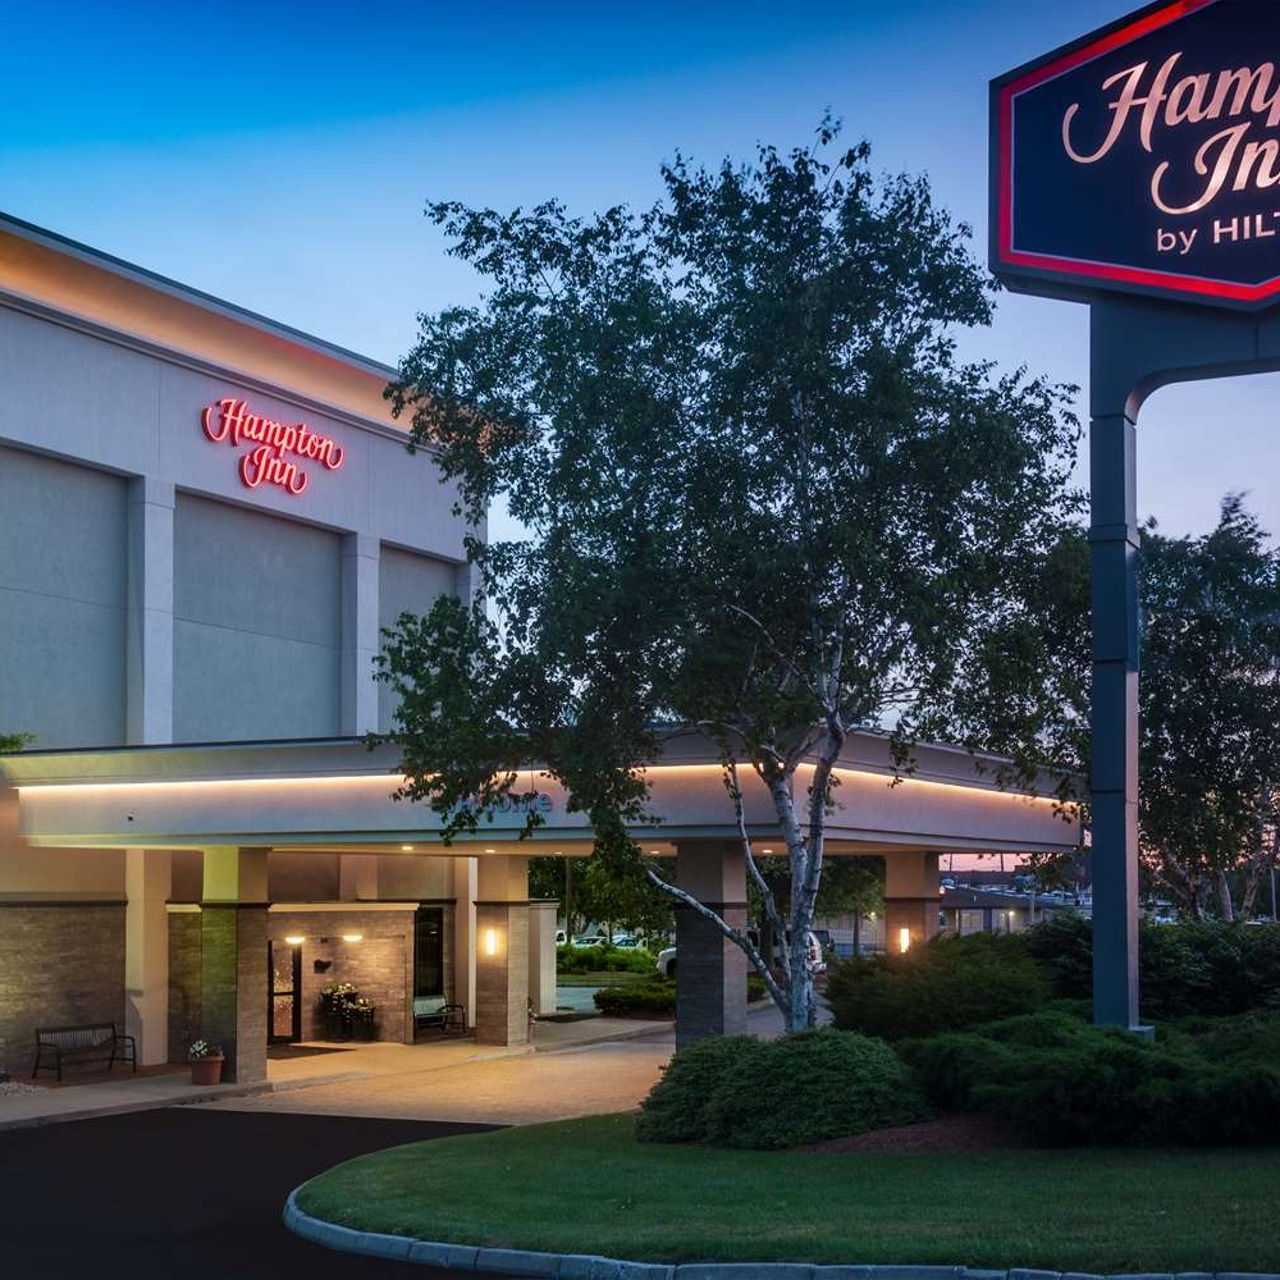 Hampton Inn Fall River-Westport - 7 HRS star hotel in Fall River